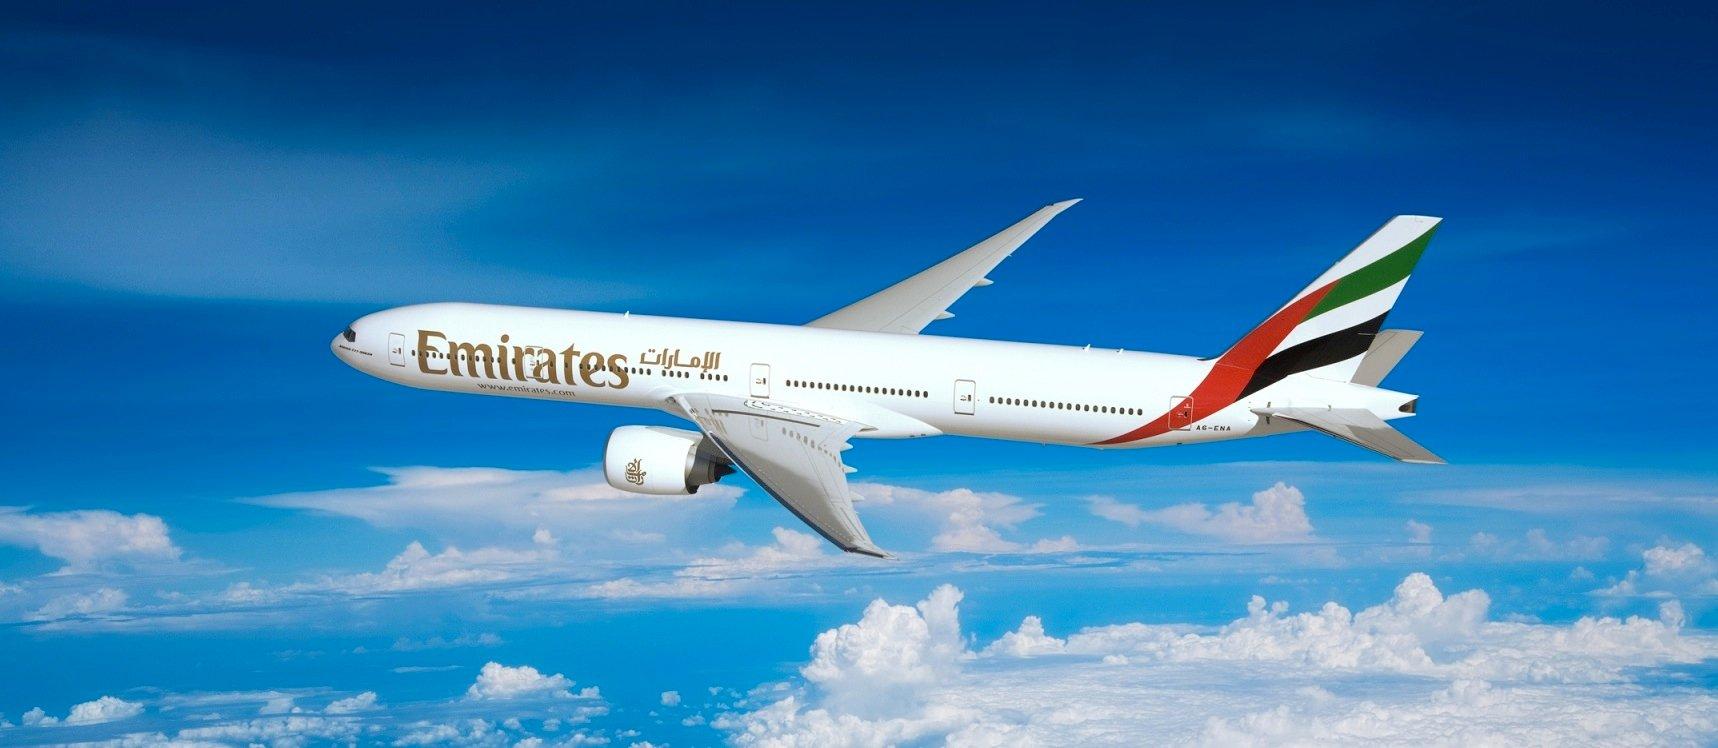 Emirates Starting Stockholm Flights